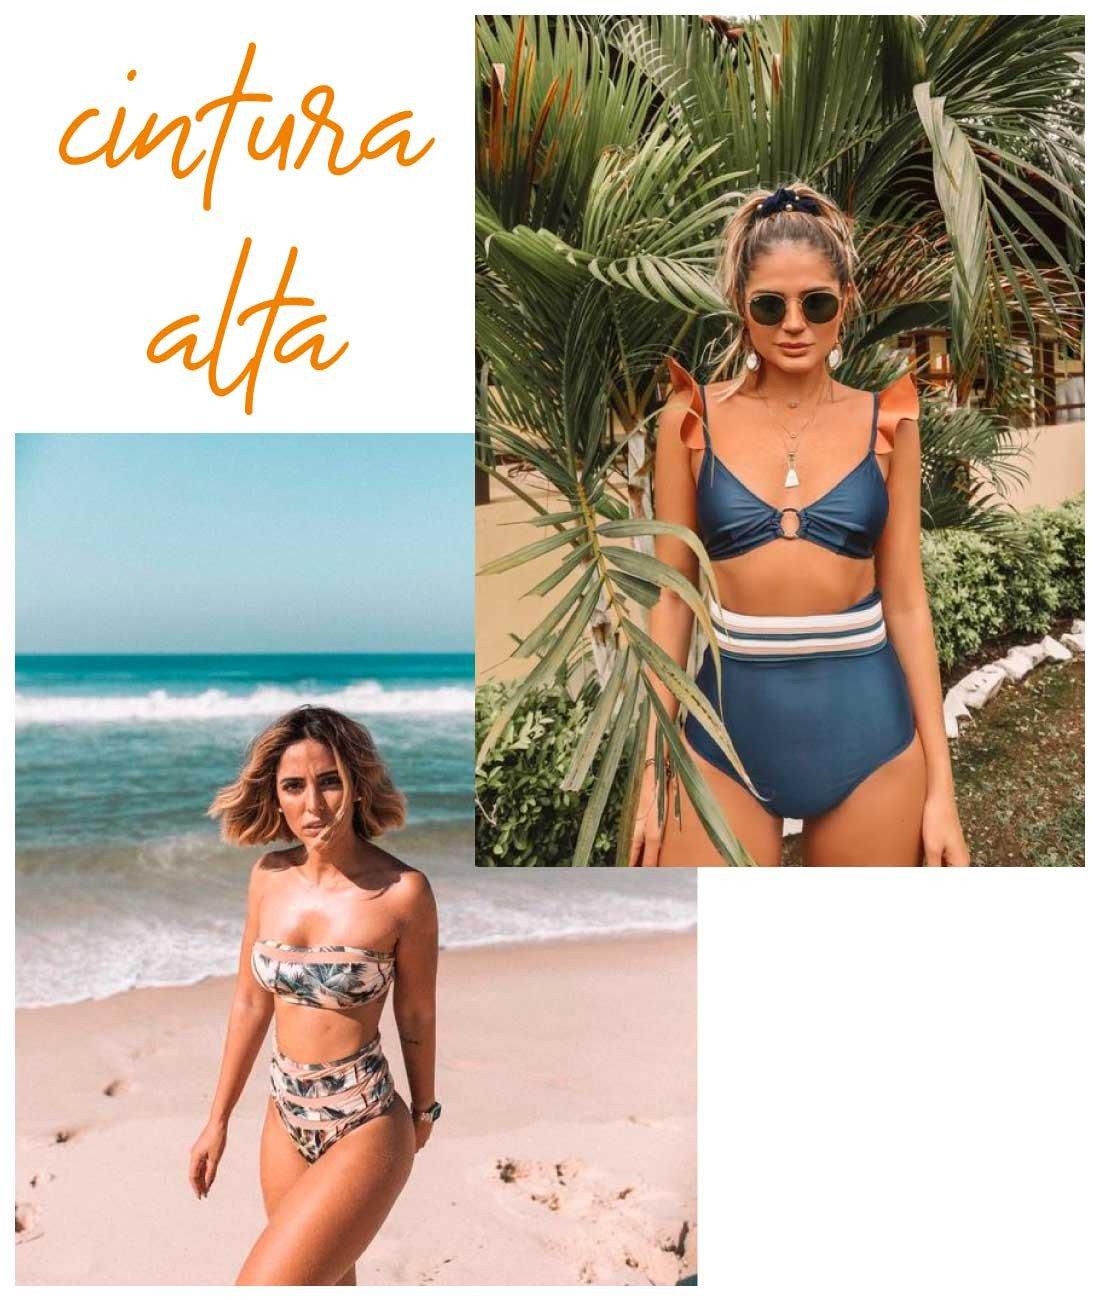 beachwear cintura alta